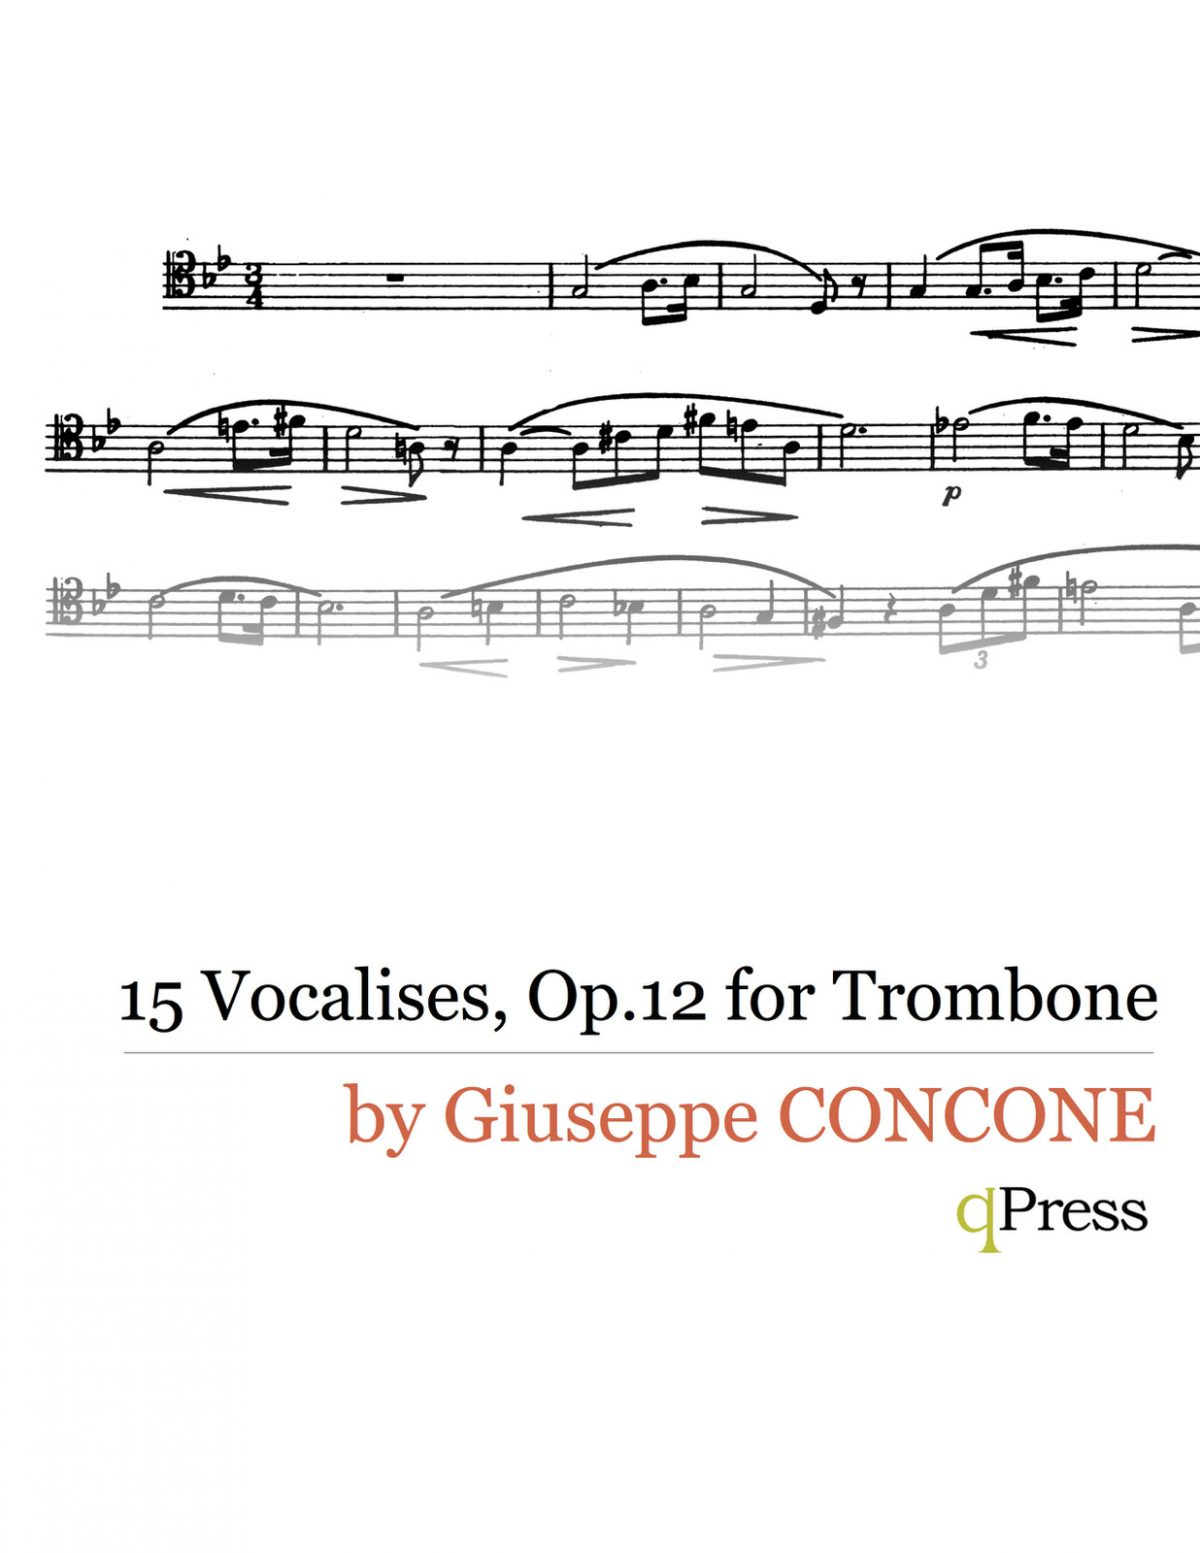 Concone, 15 Vocalises, Op.12 Trombone